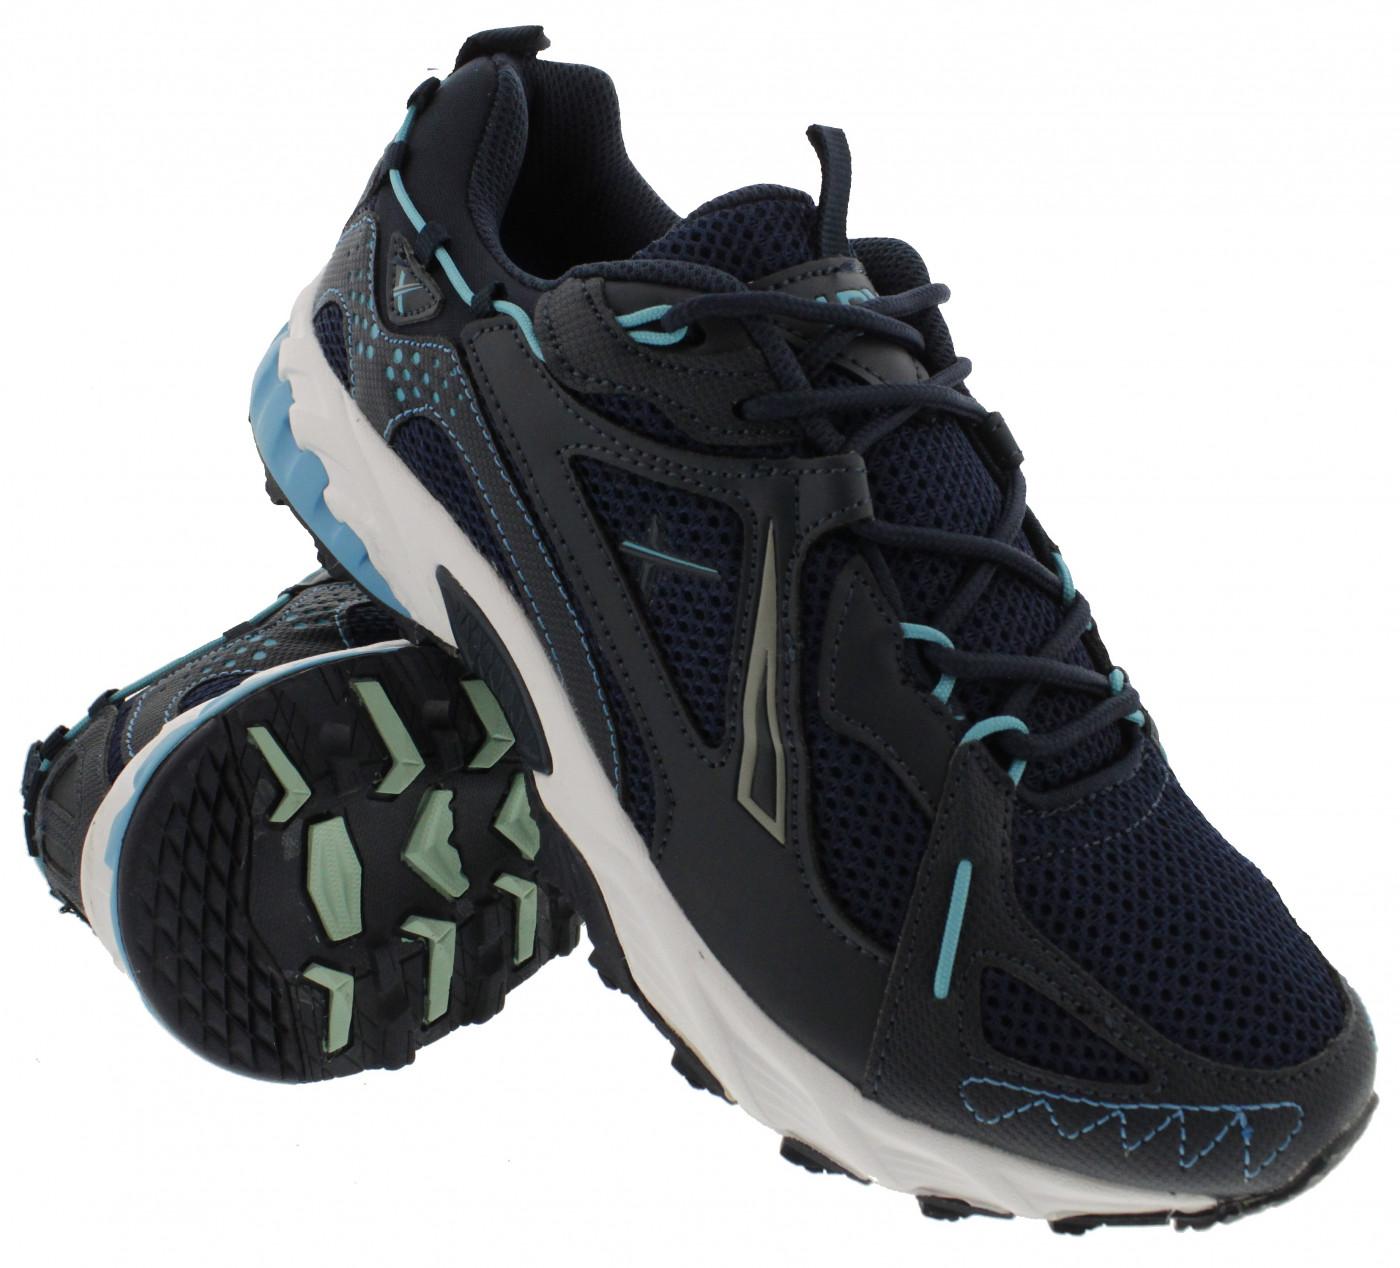 Kondor Man's Shoes MJ-9101A Navy Blue